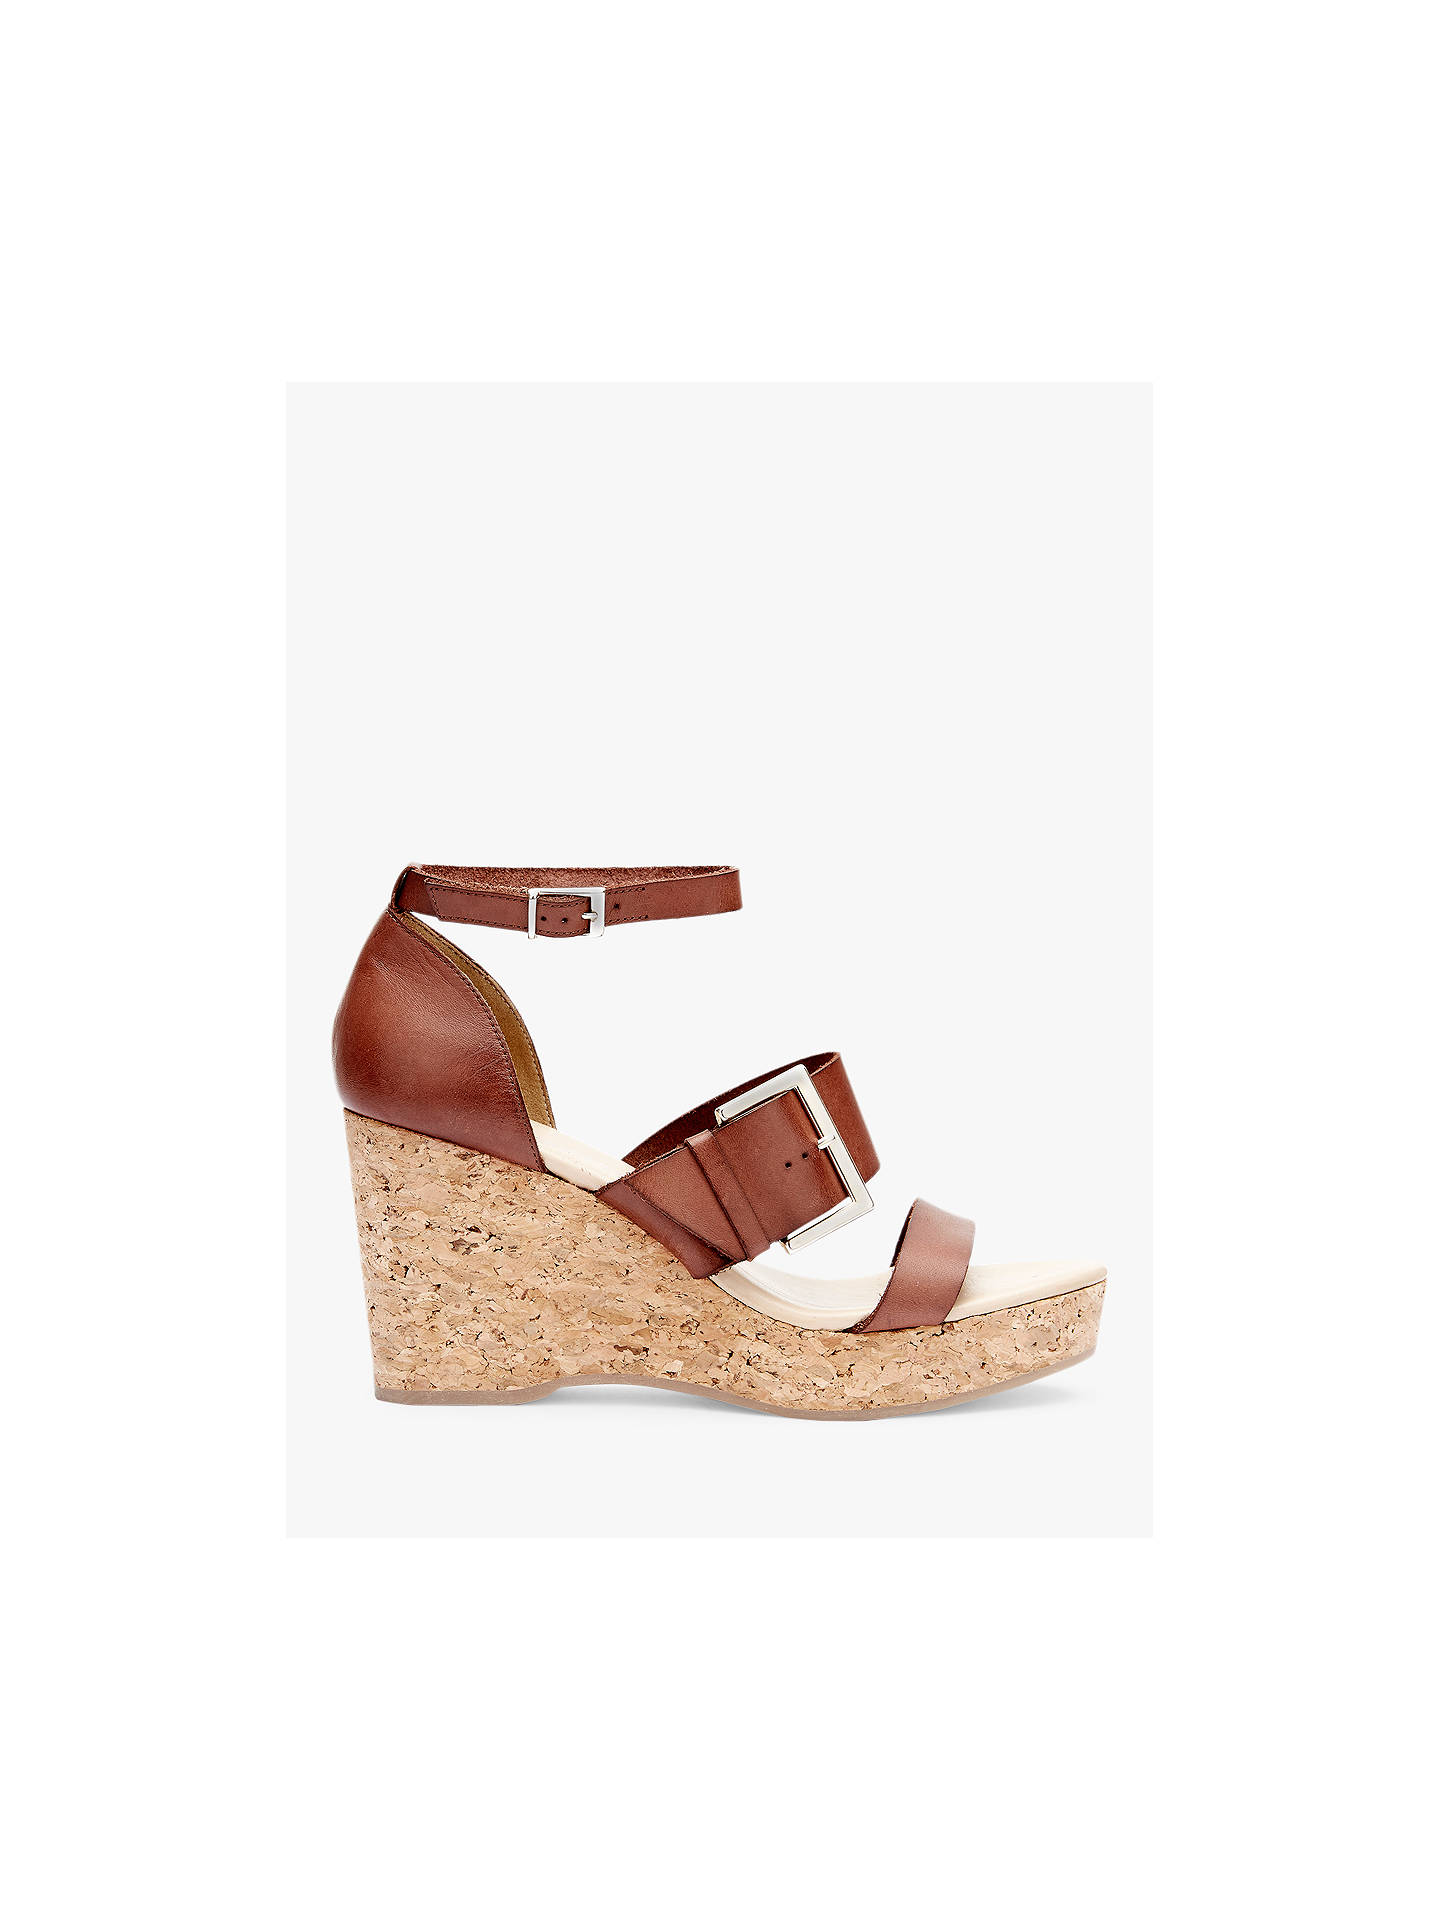 5e040d5b2d8 Buy Mint Velvet Eliza Strappy Wedge Heel Sandals